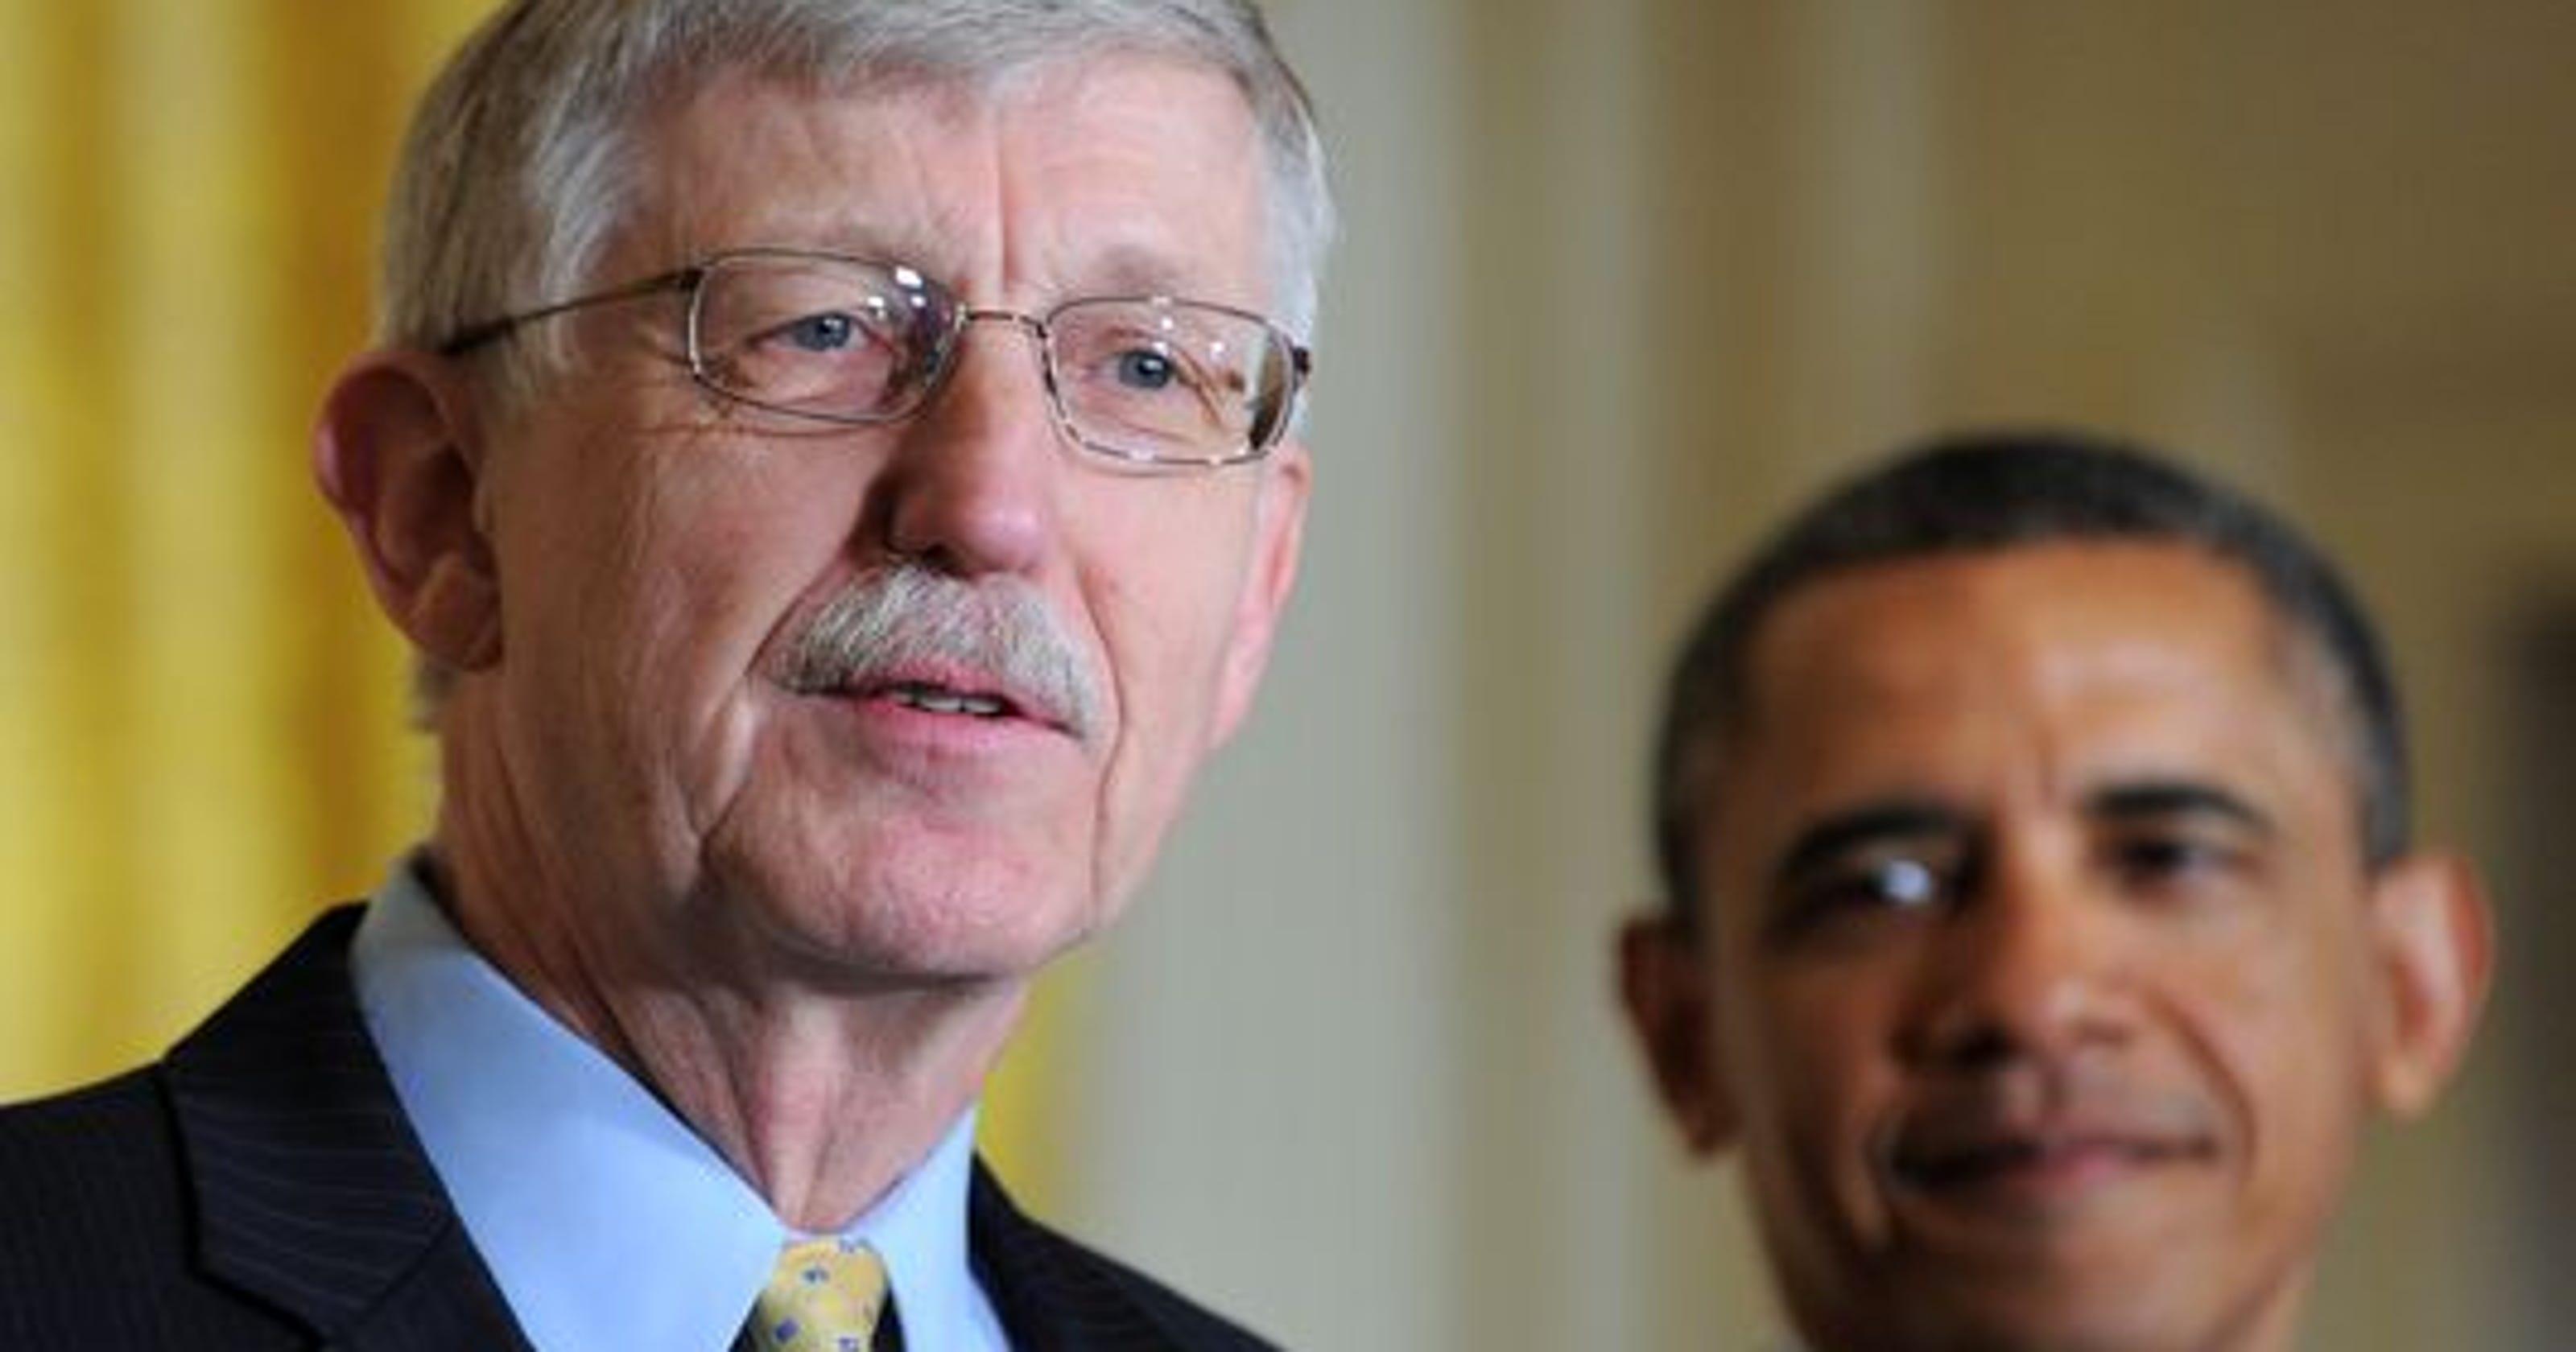 NIH director on legalizing marijuana: Not so fast